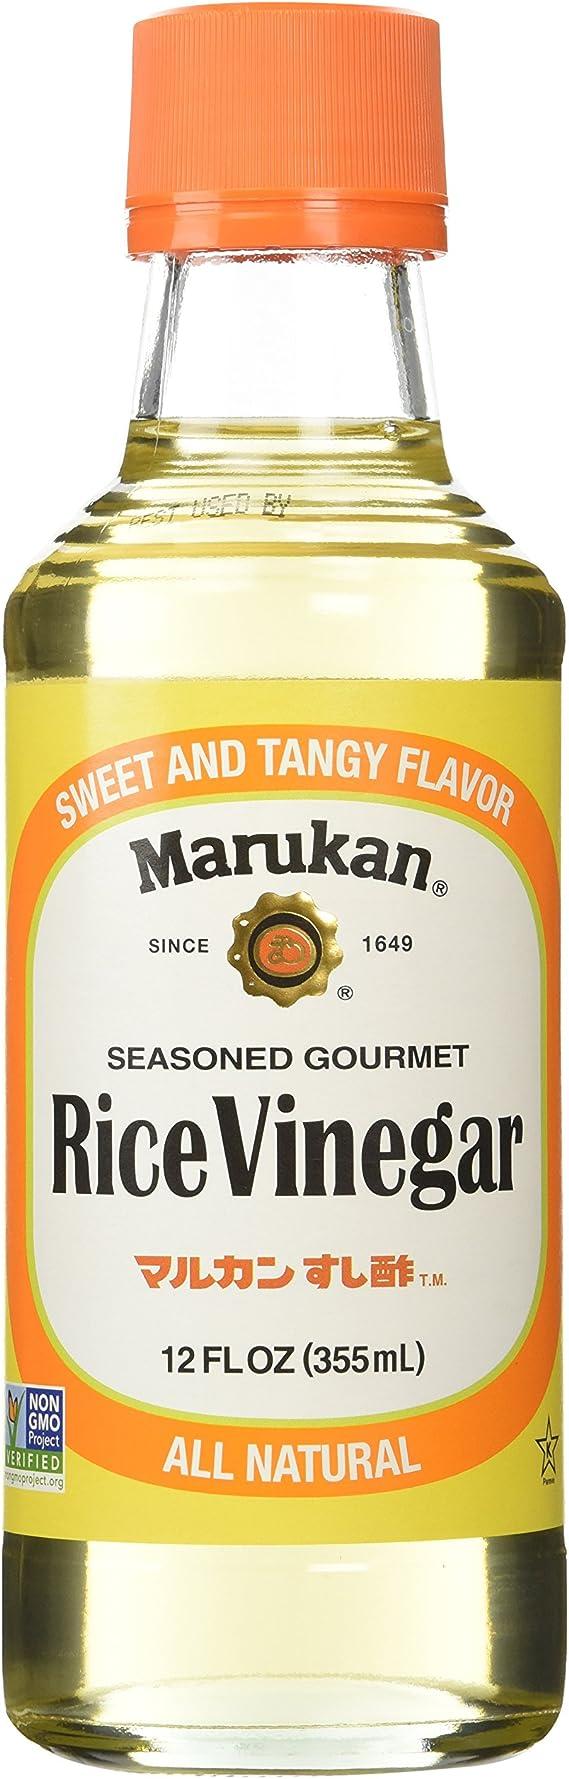 Marukan Seasoned Rice Vinegar 12 Oz (12 oz)